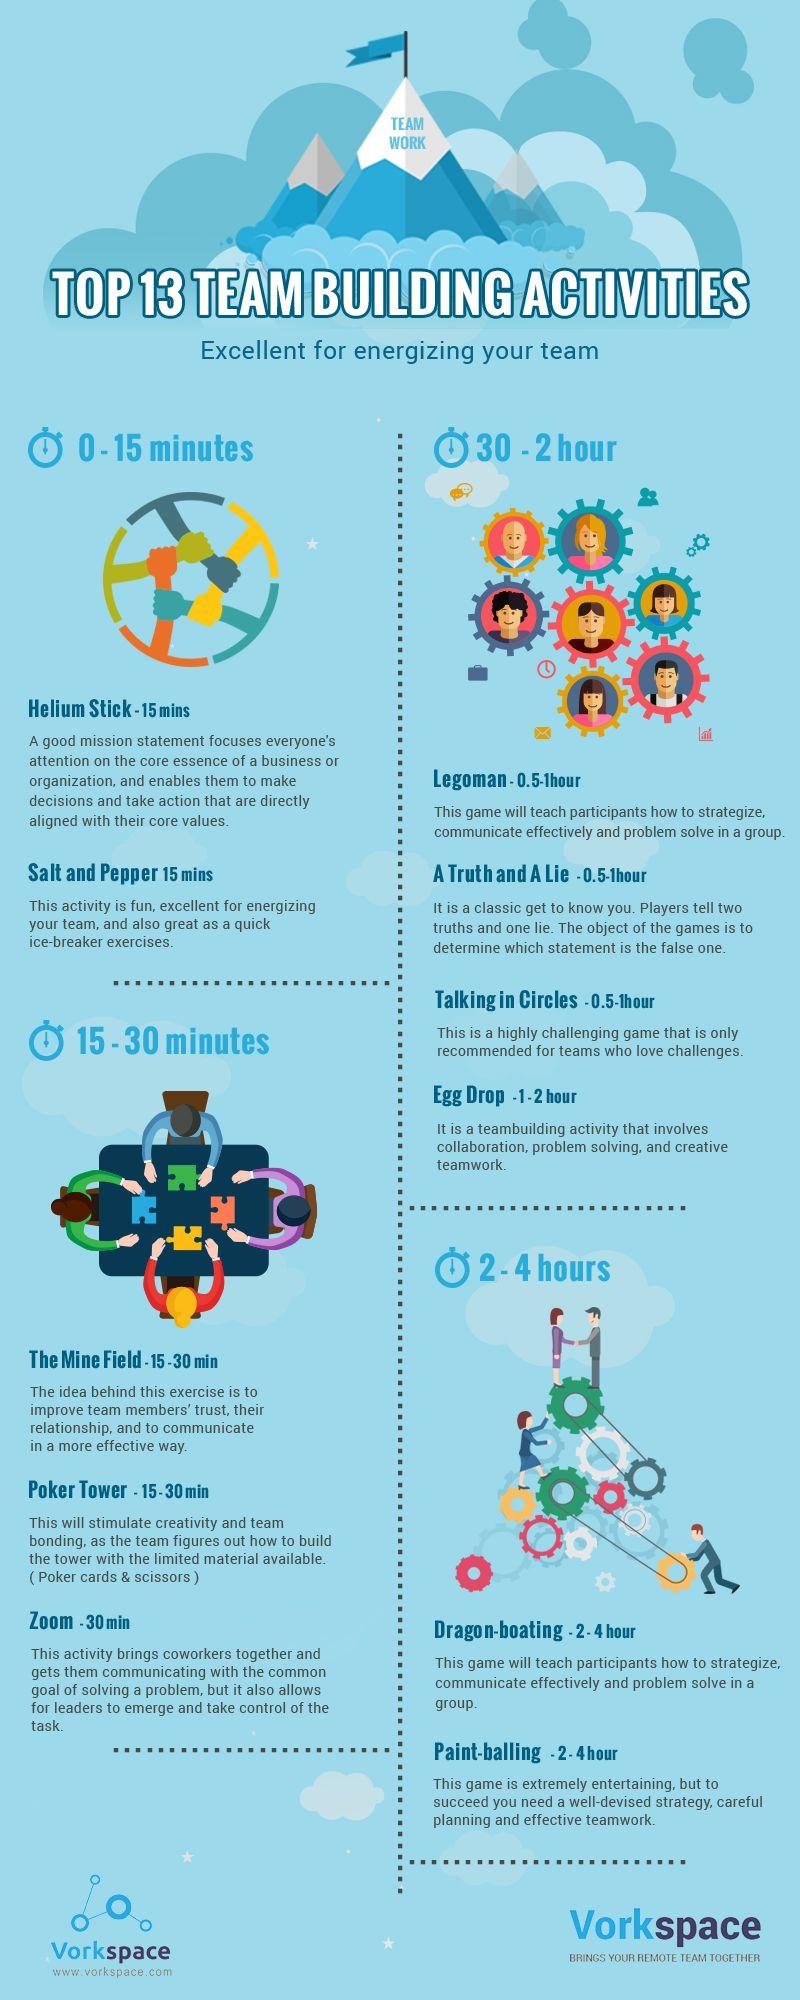 Top 13 Remote Team Building Activities Infographic Team Building Activities Team Building Games Fun Team Building Activities